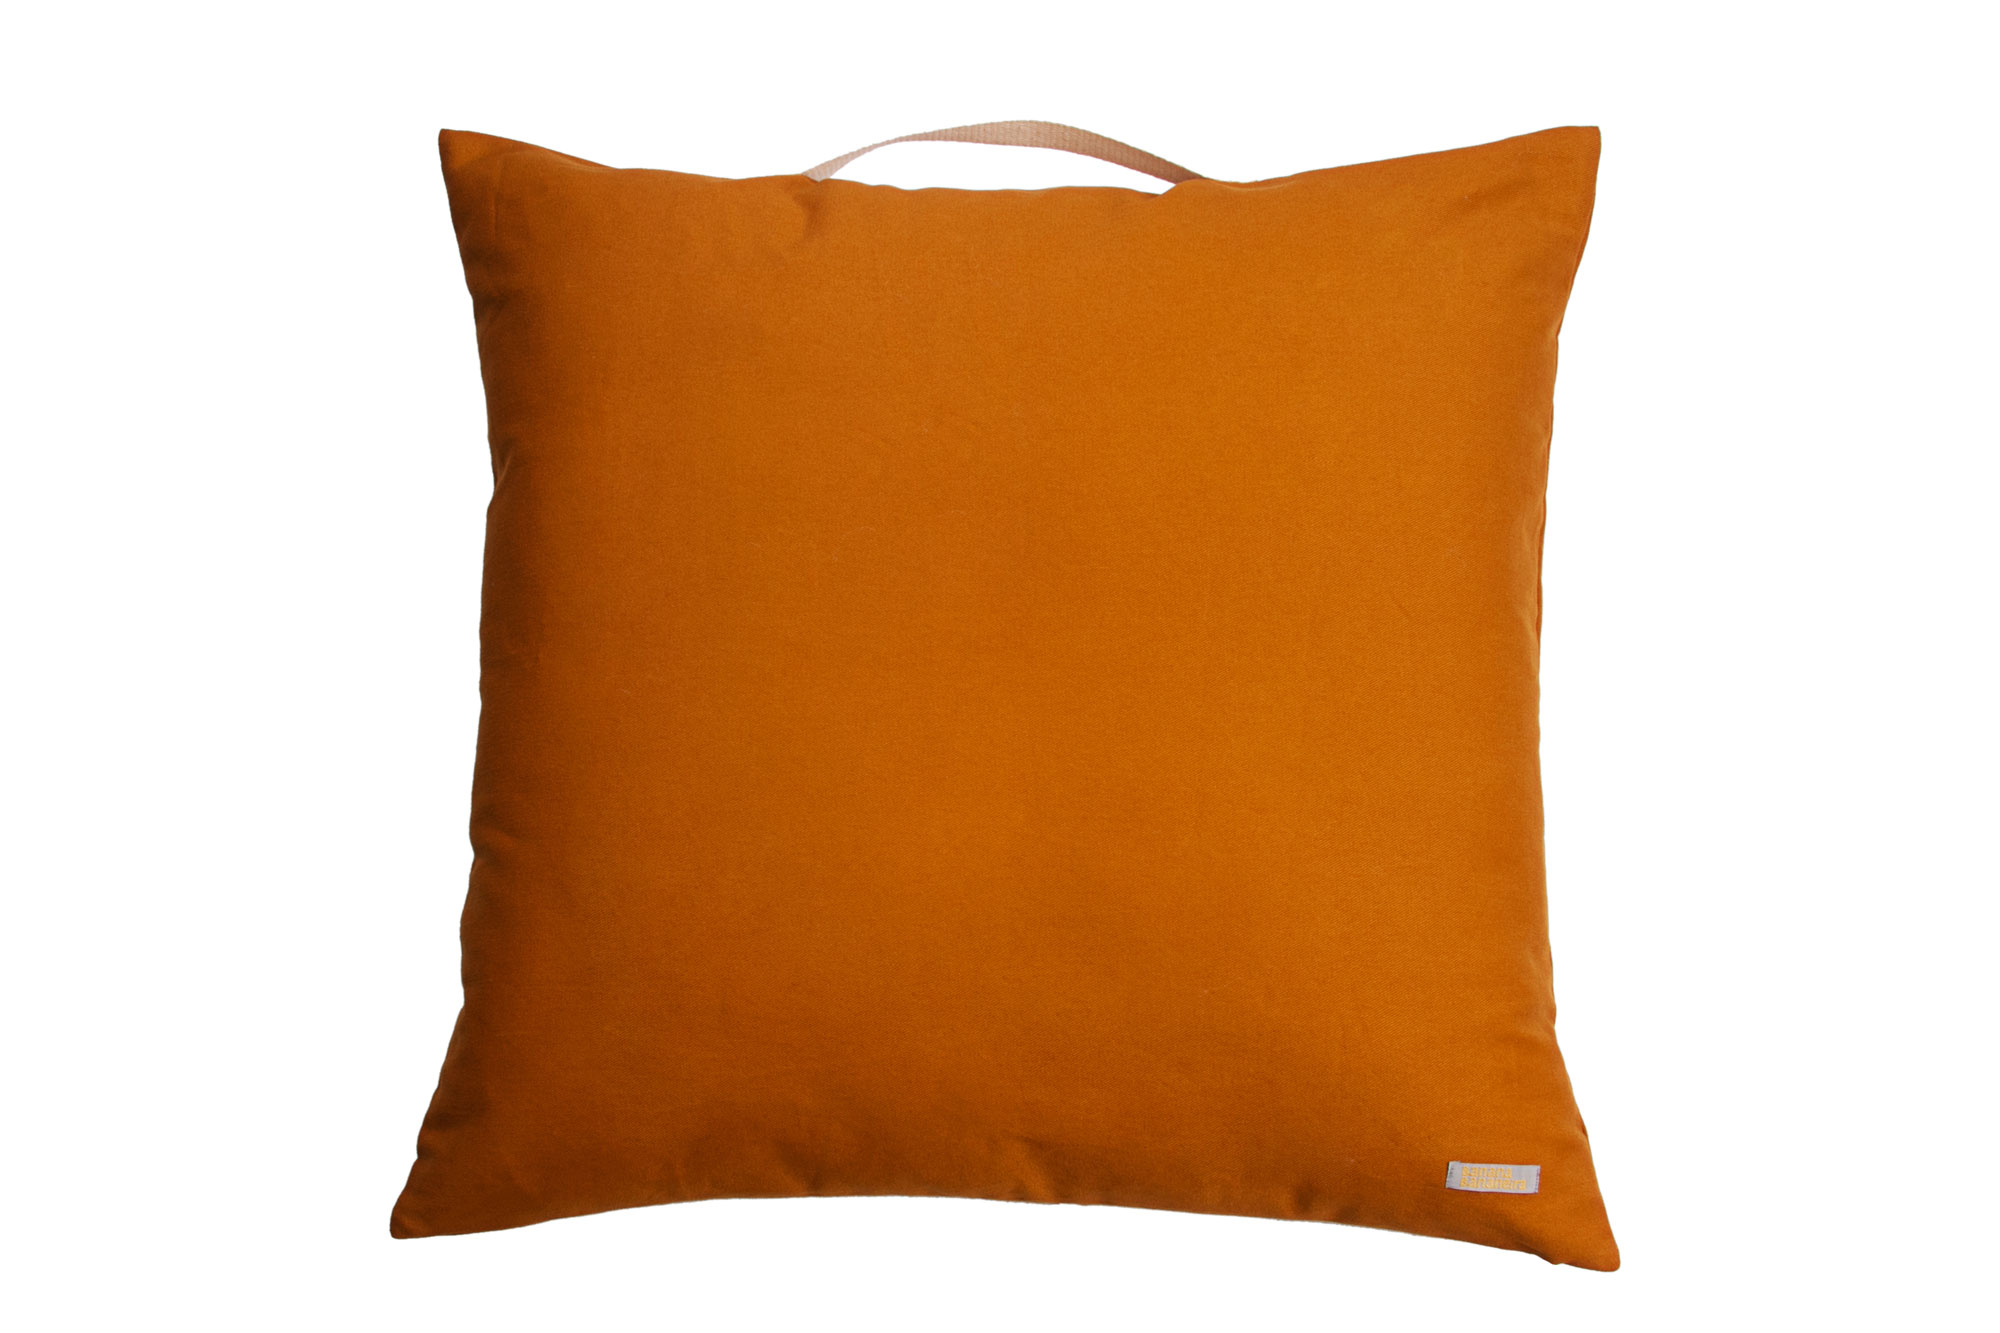 Almofadão pufe laranja